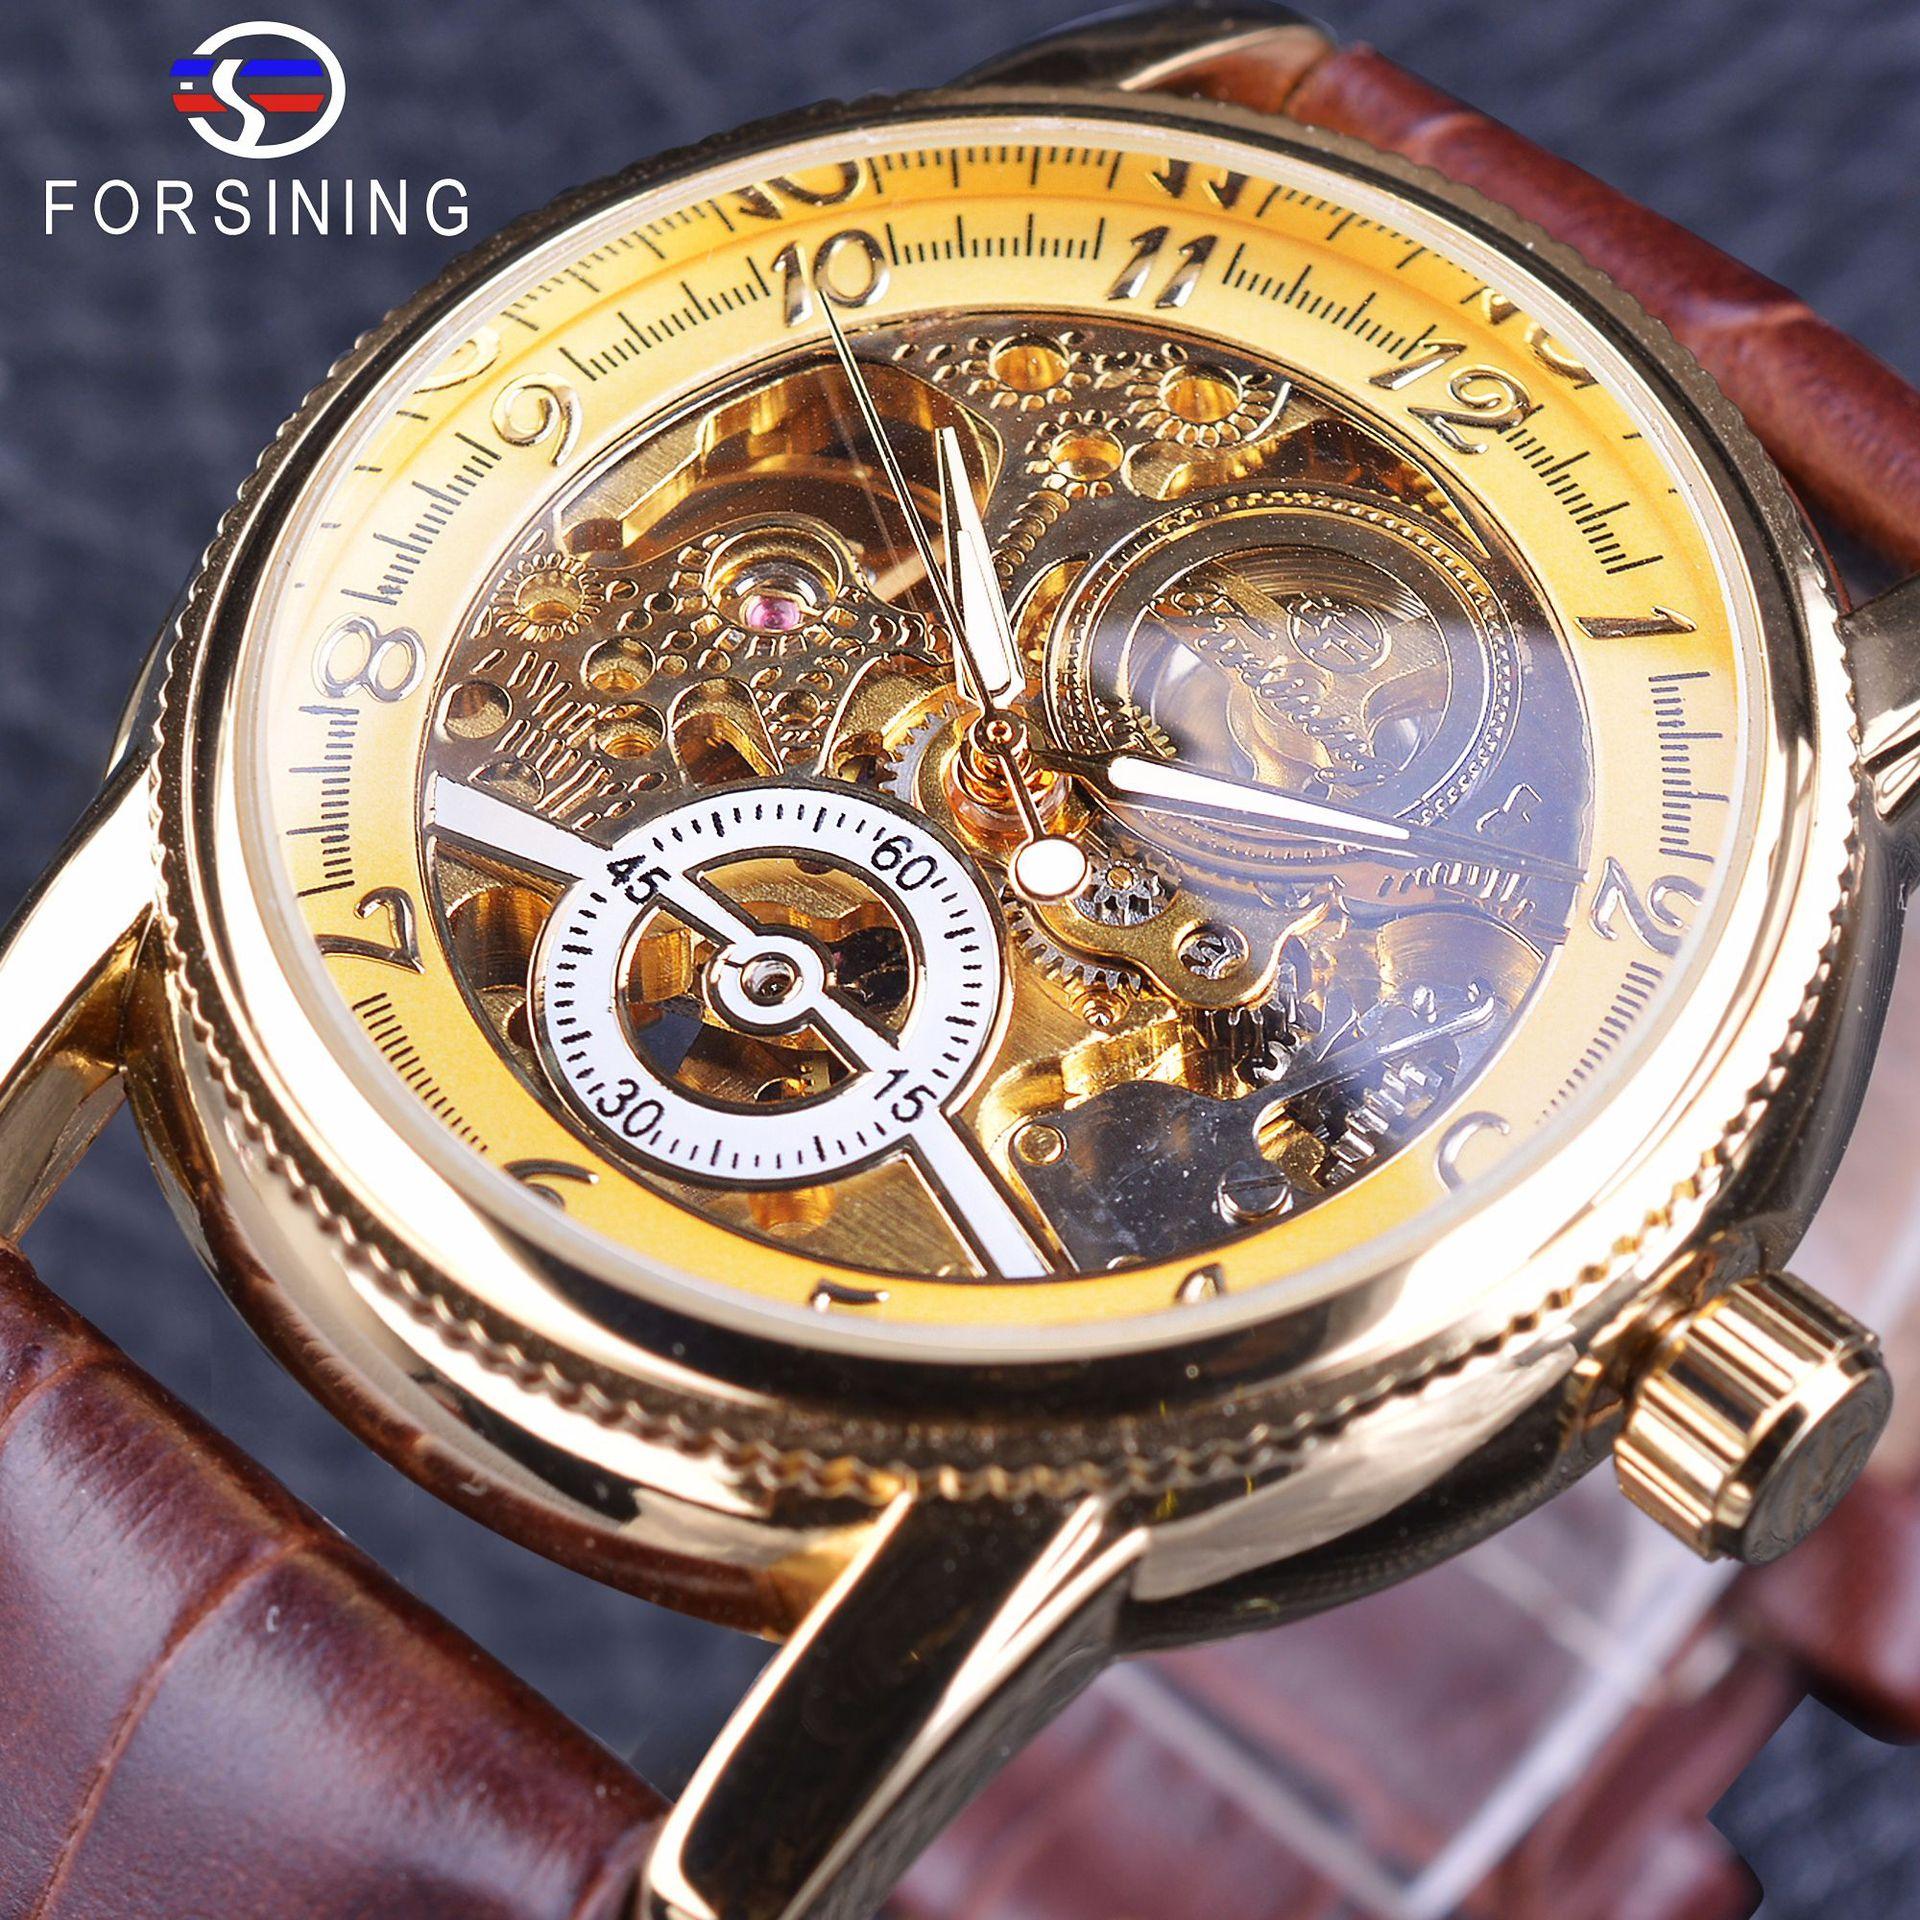 Mens watch fashion double side hollow automatic mechanical watch luminous waterproof leather belt boutique watch mens fashion